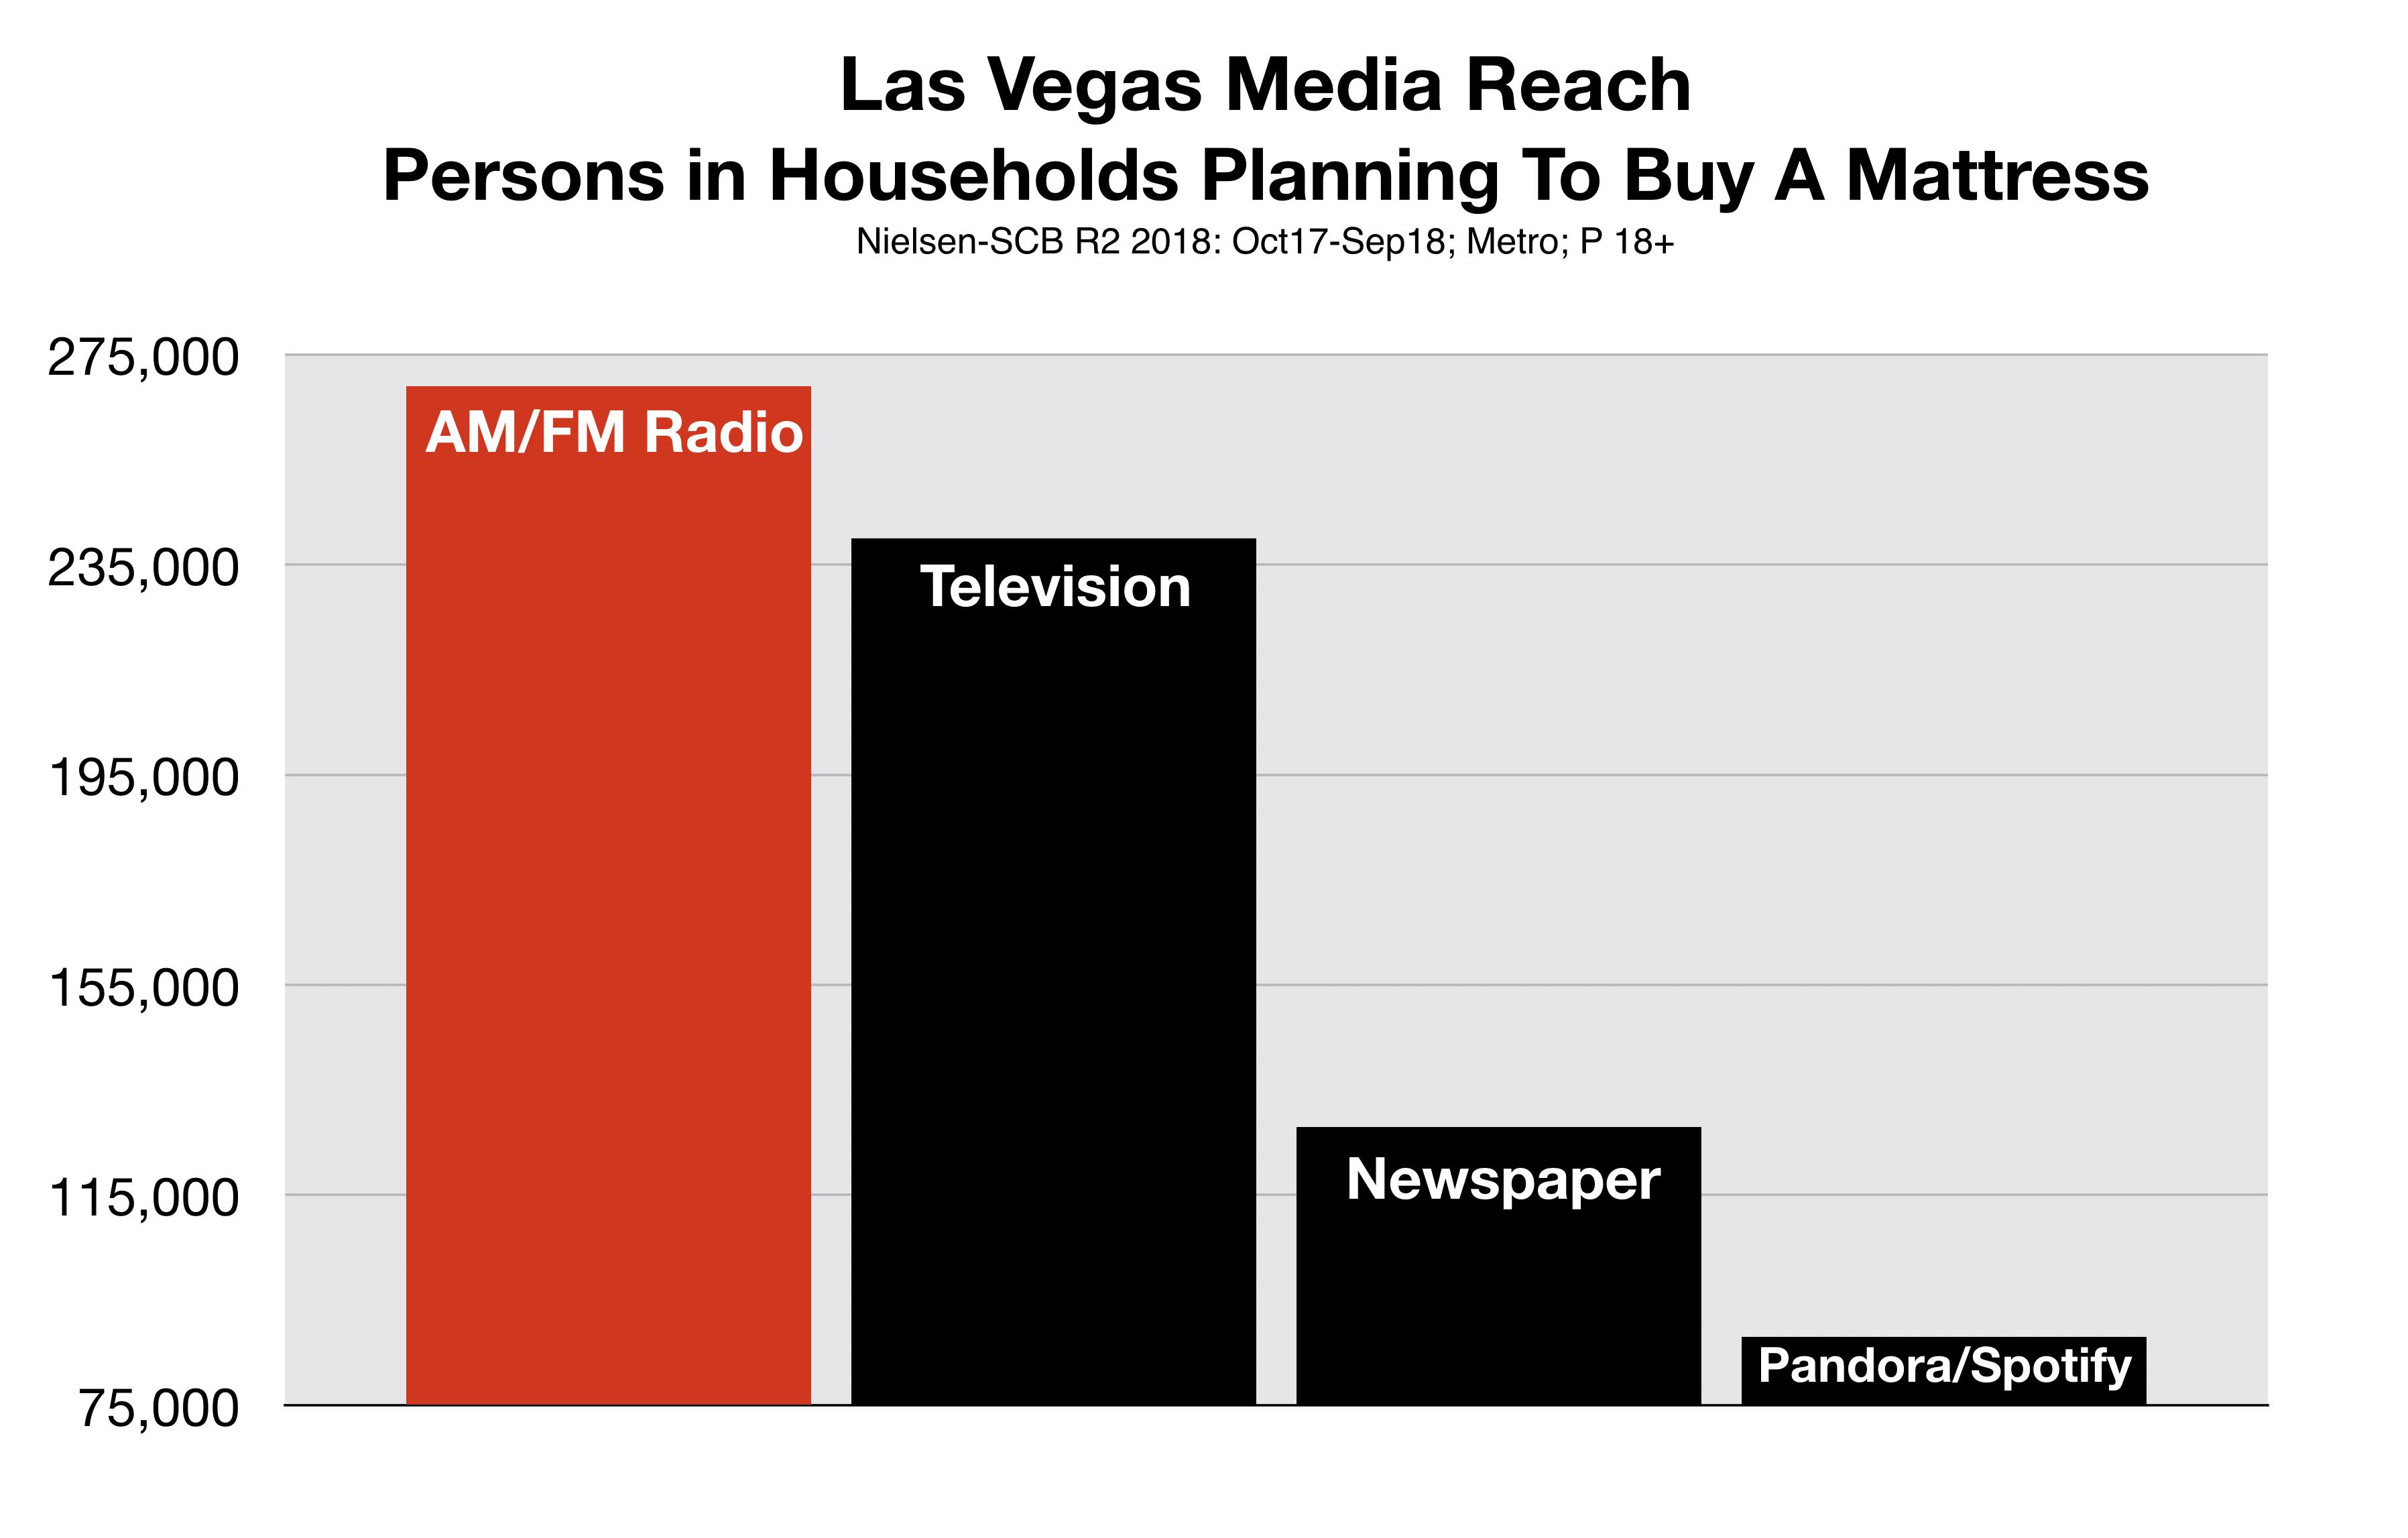 Advertise in Las Vegas Radio Reaches Mattress Buyers